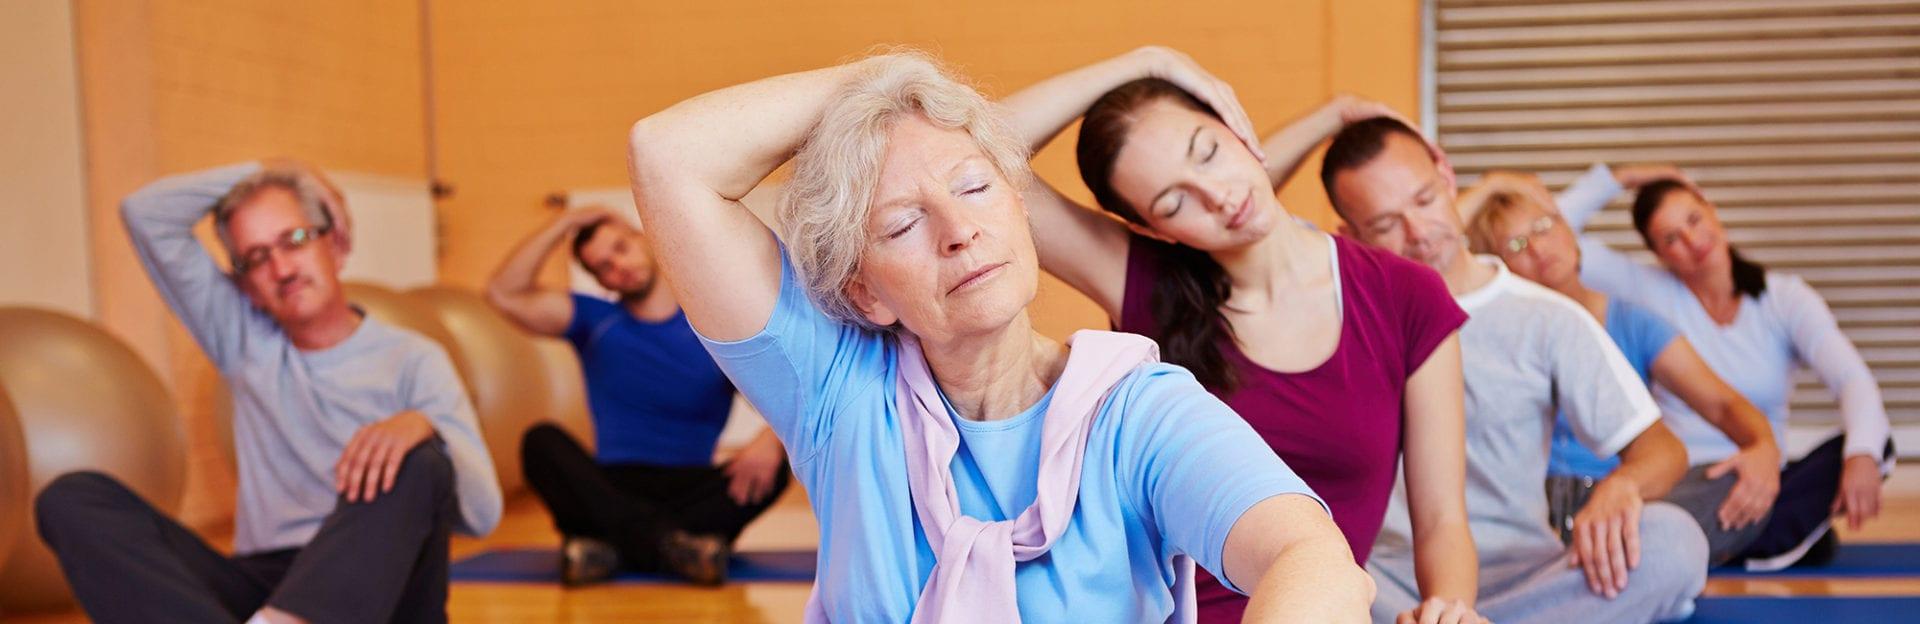 Adult Wellness | The Gateway Family YMCA